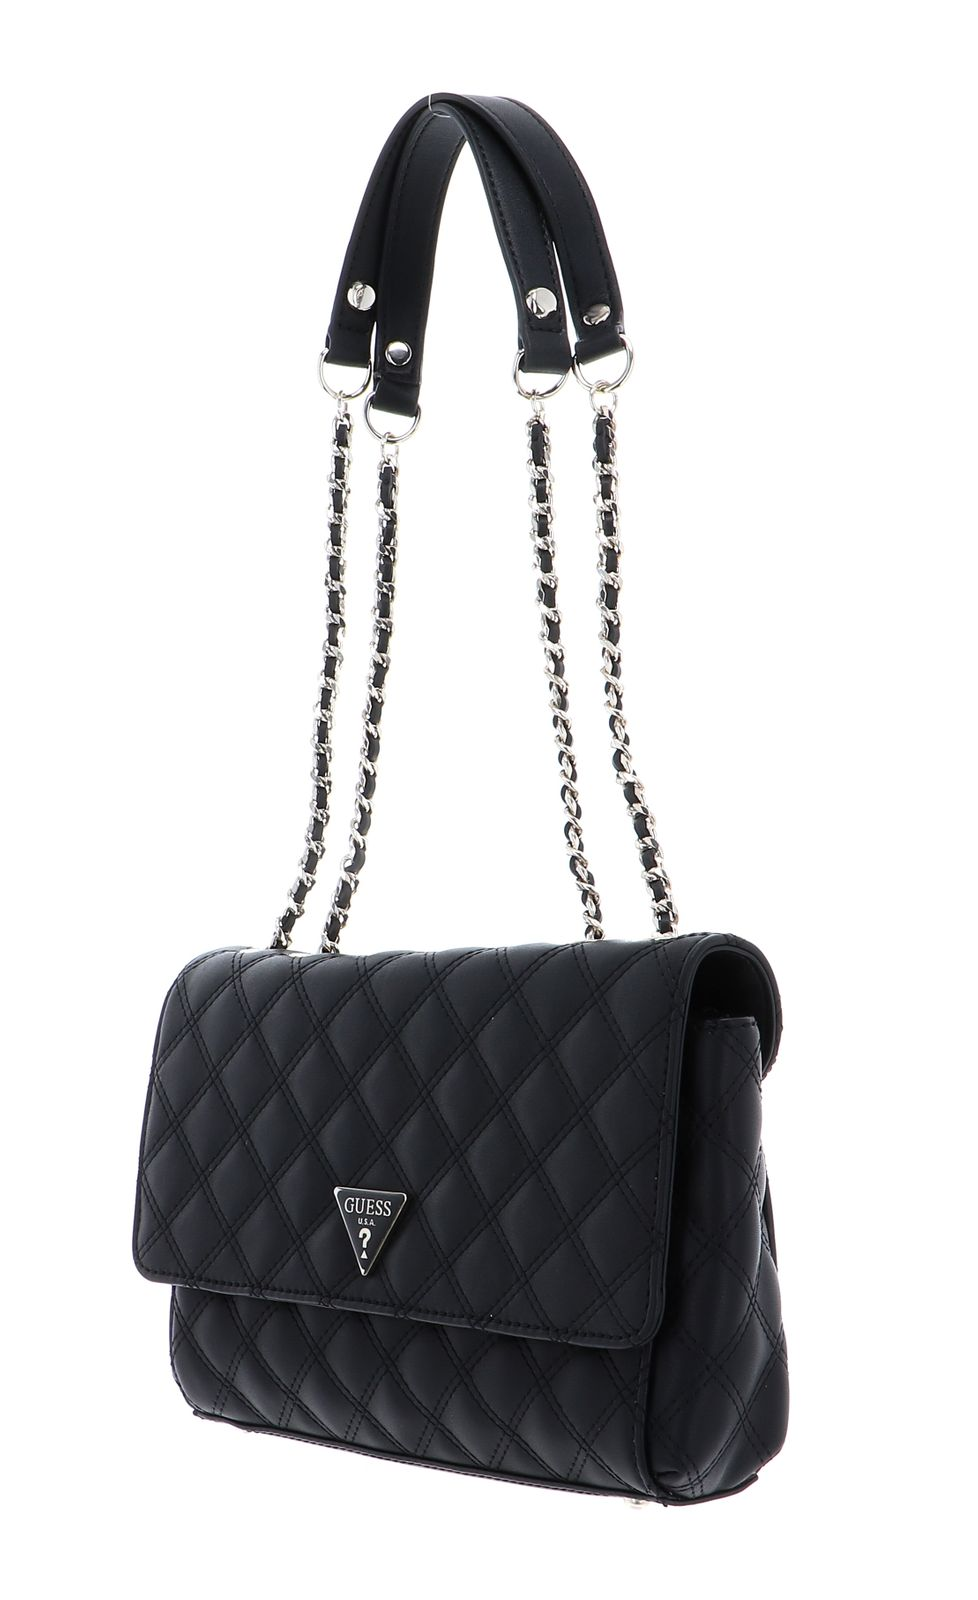 Details zu GUESS Cessily Convertible Xbody Flap Umhängetasche Tasche Black Schwarz Neu